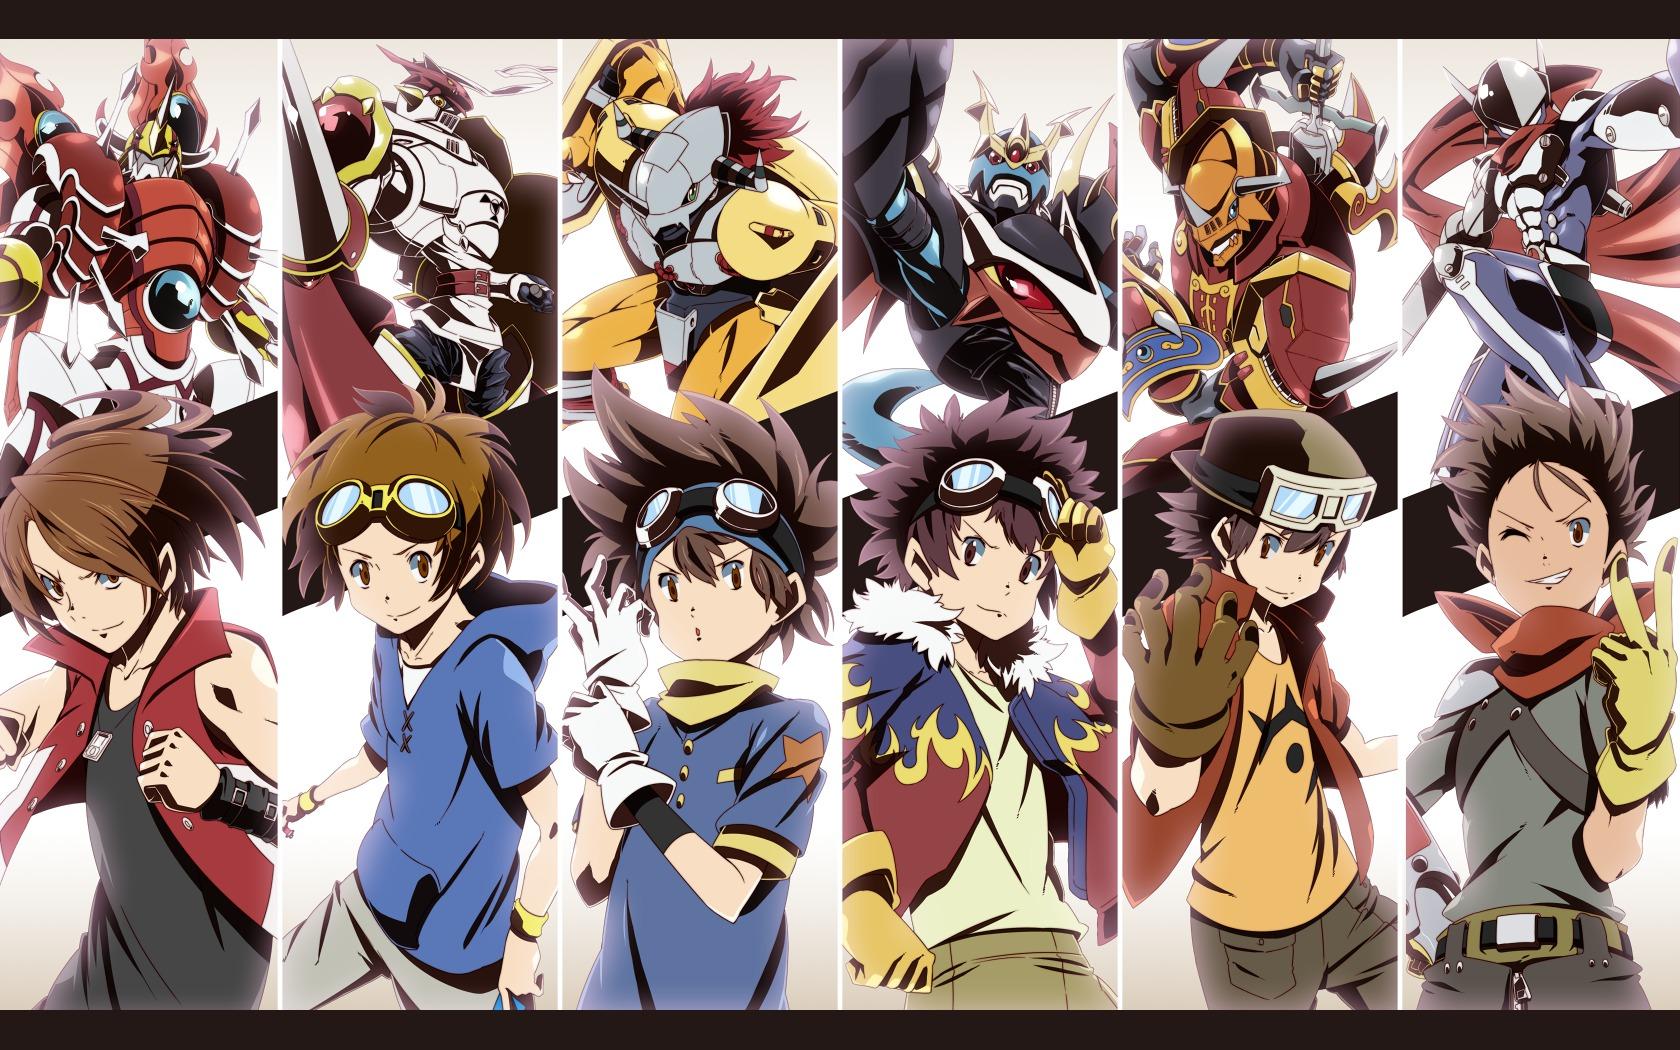 Digimon Team Leaders Anime Art Cool Davis Epic Goggles Wallpaper 1680x1050